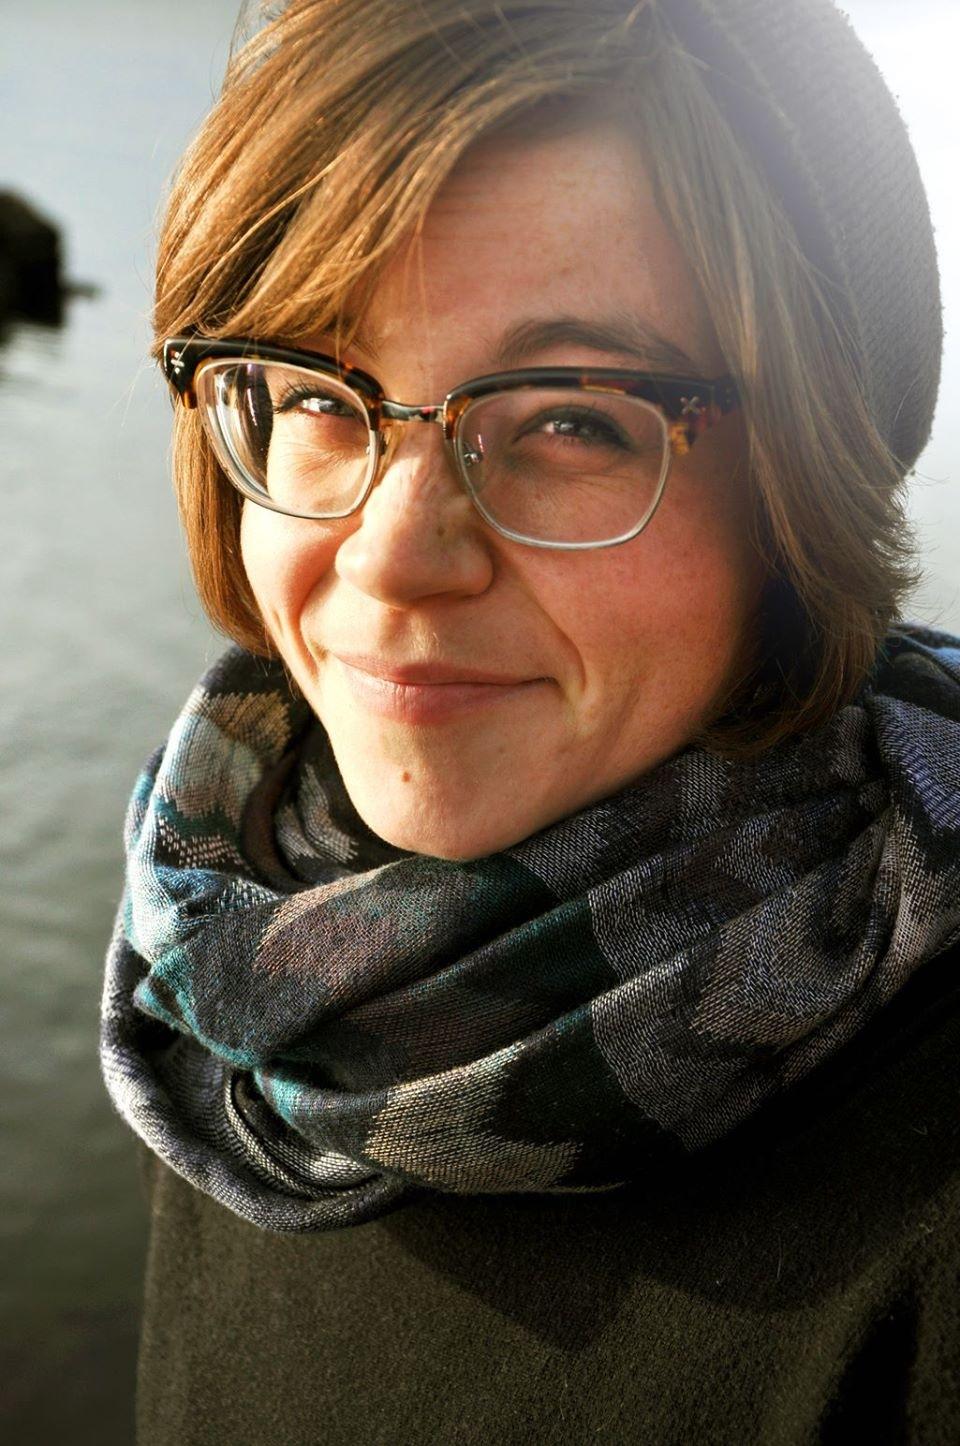 Julia Rhinelander